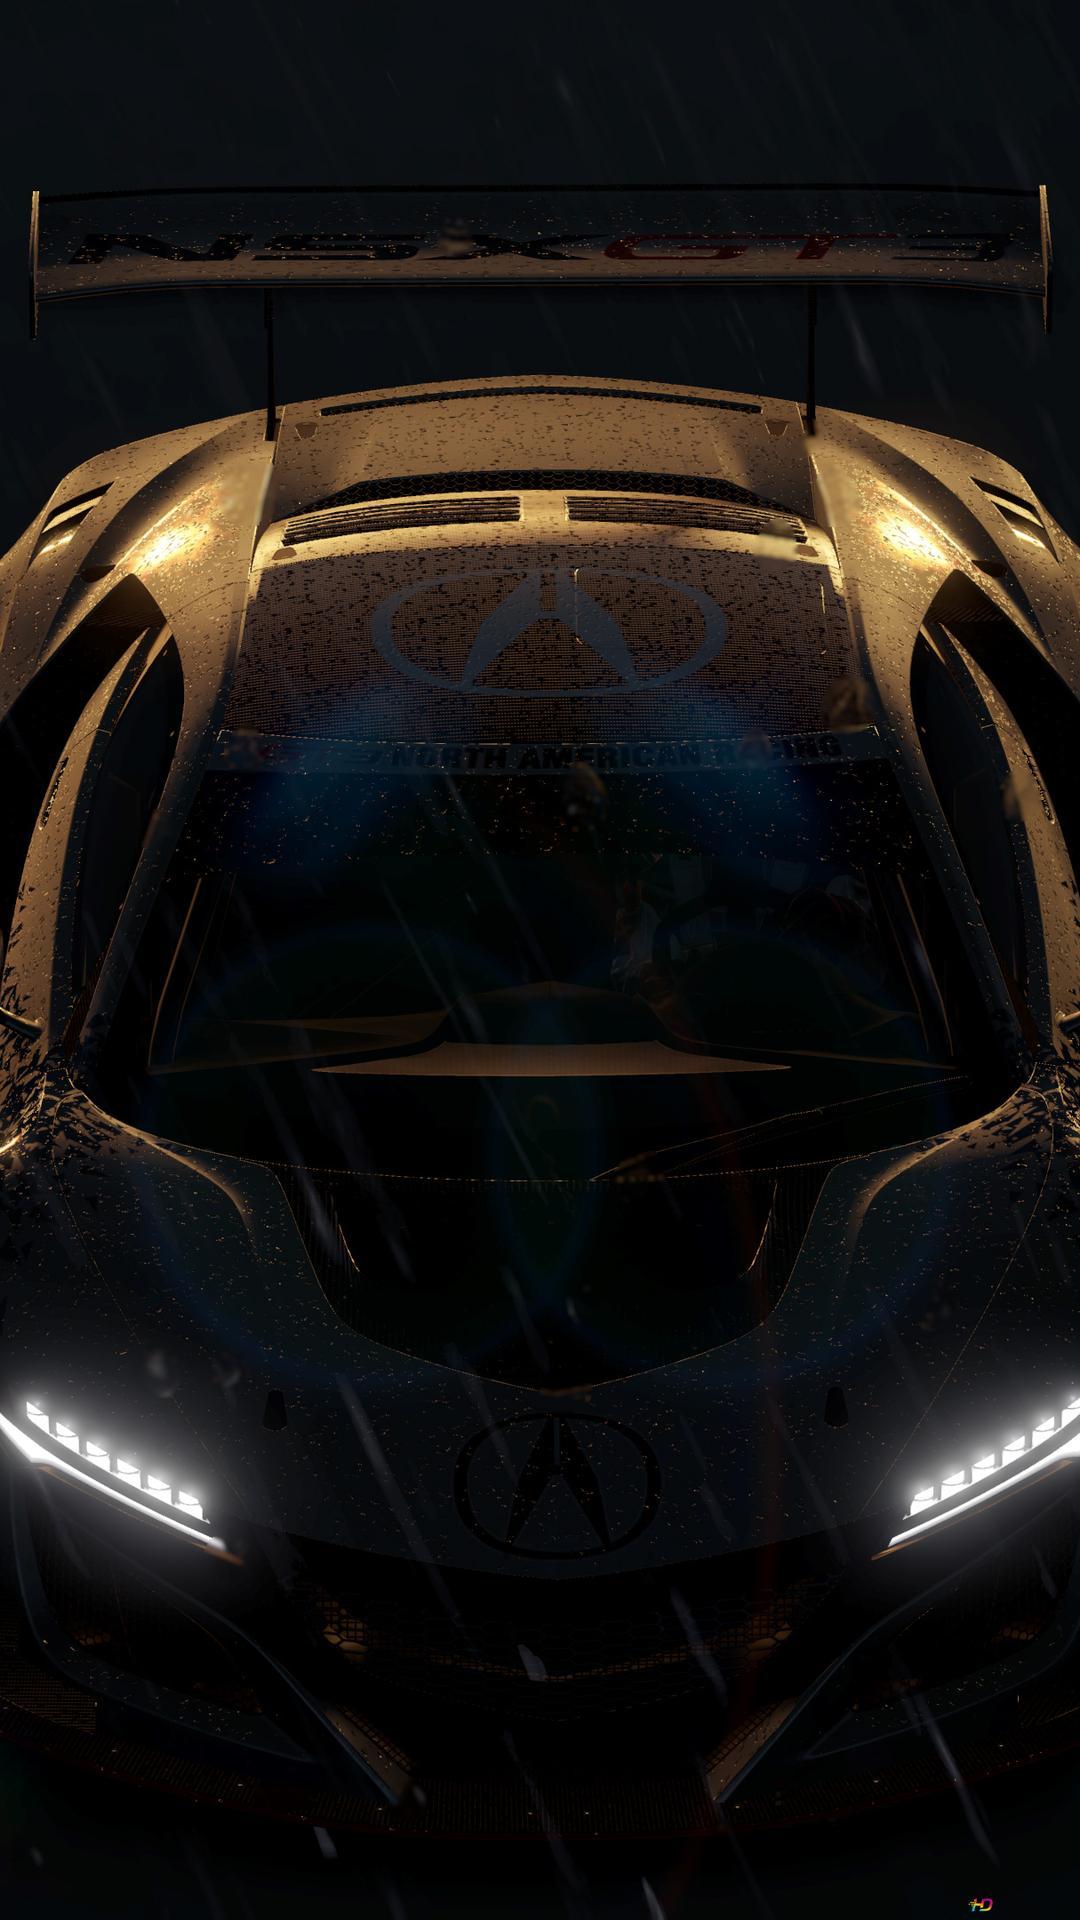 Forza Horizon 3 game - Acura NSX GT3 HD wallpaper download